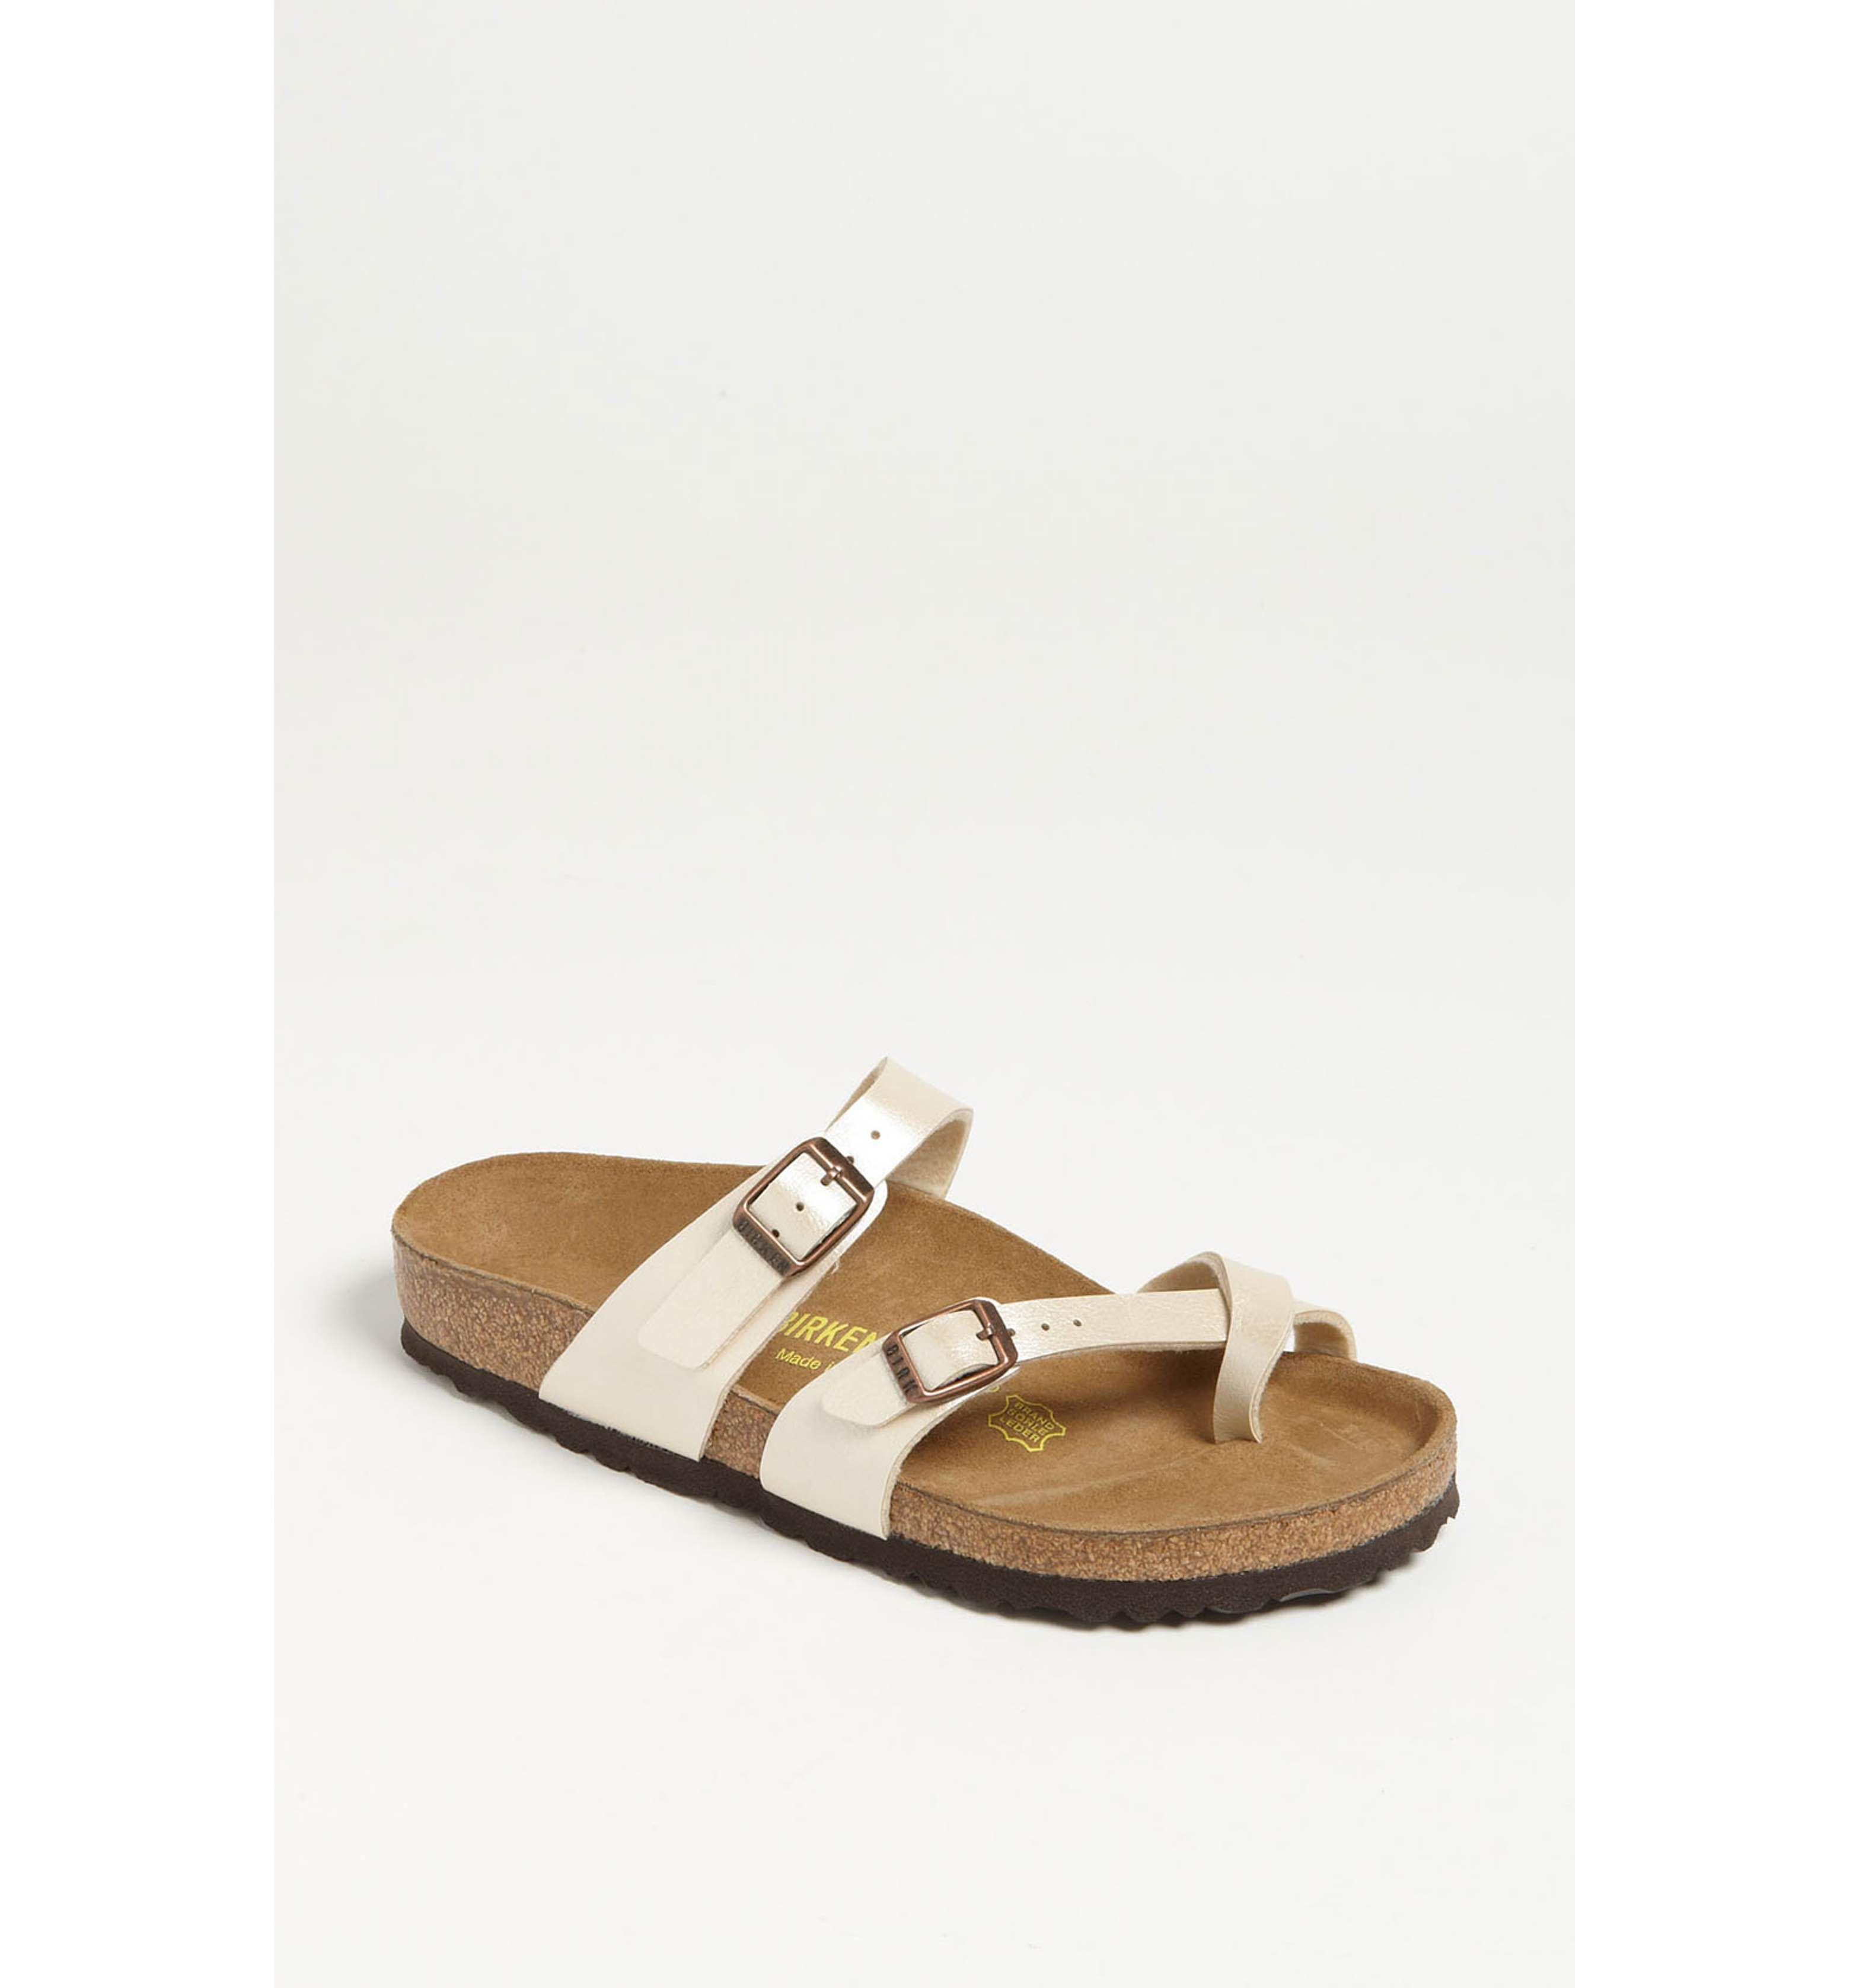 95577bd63265 Main Image - Birkenstock  Mayari  Birko-Flor™ Sandal (Women ...